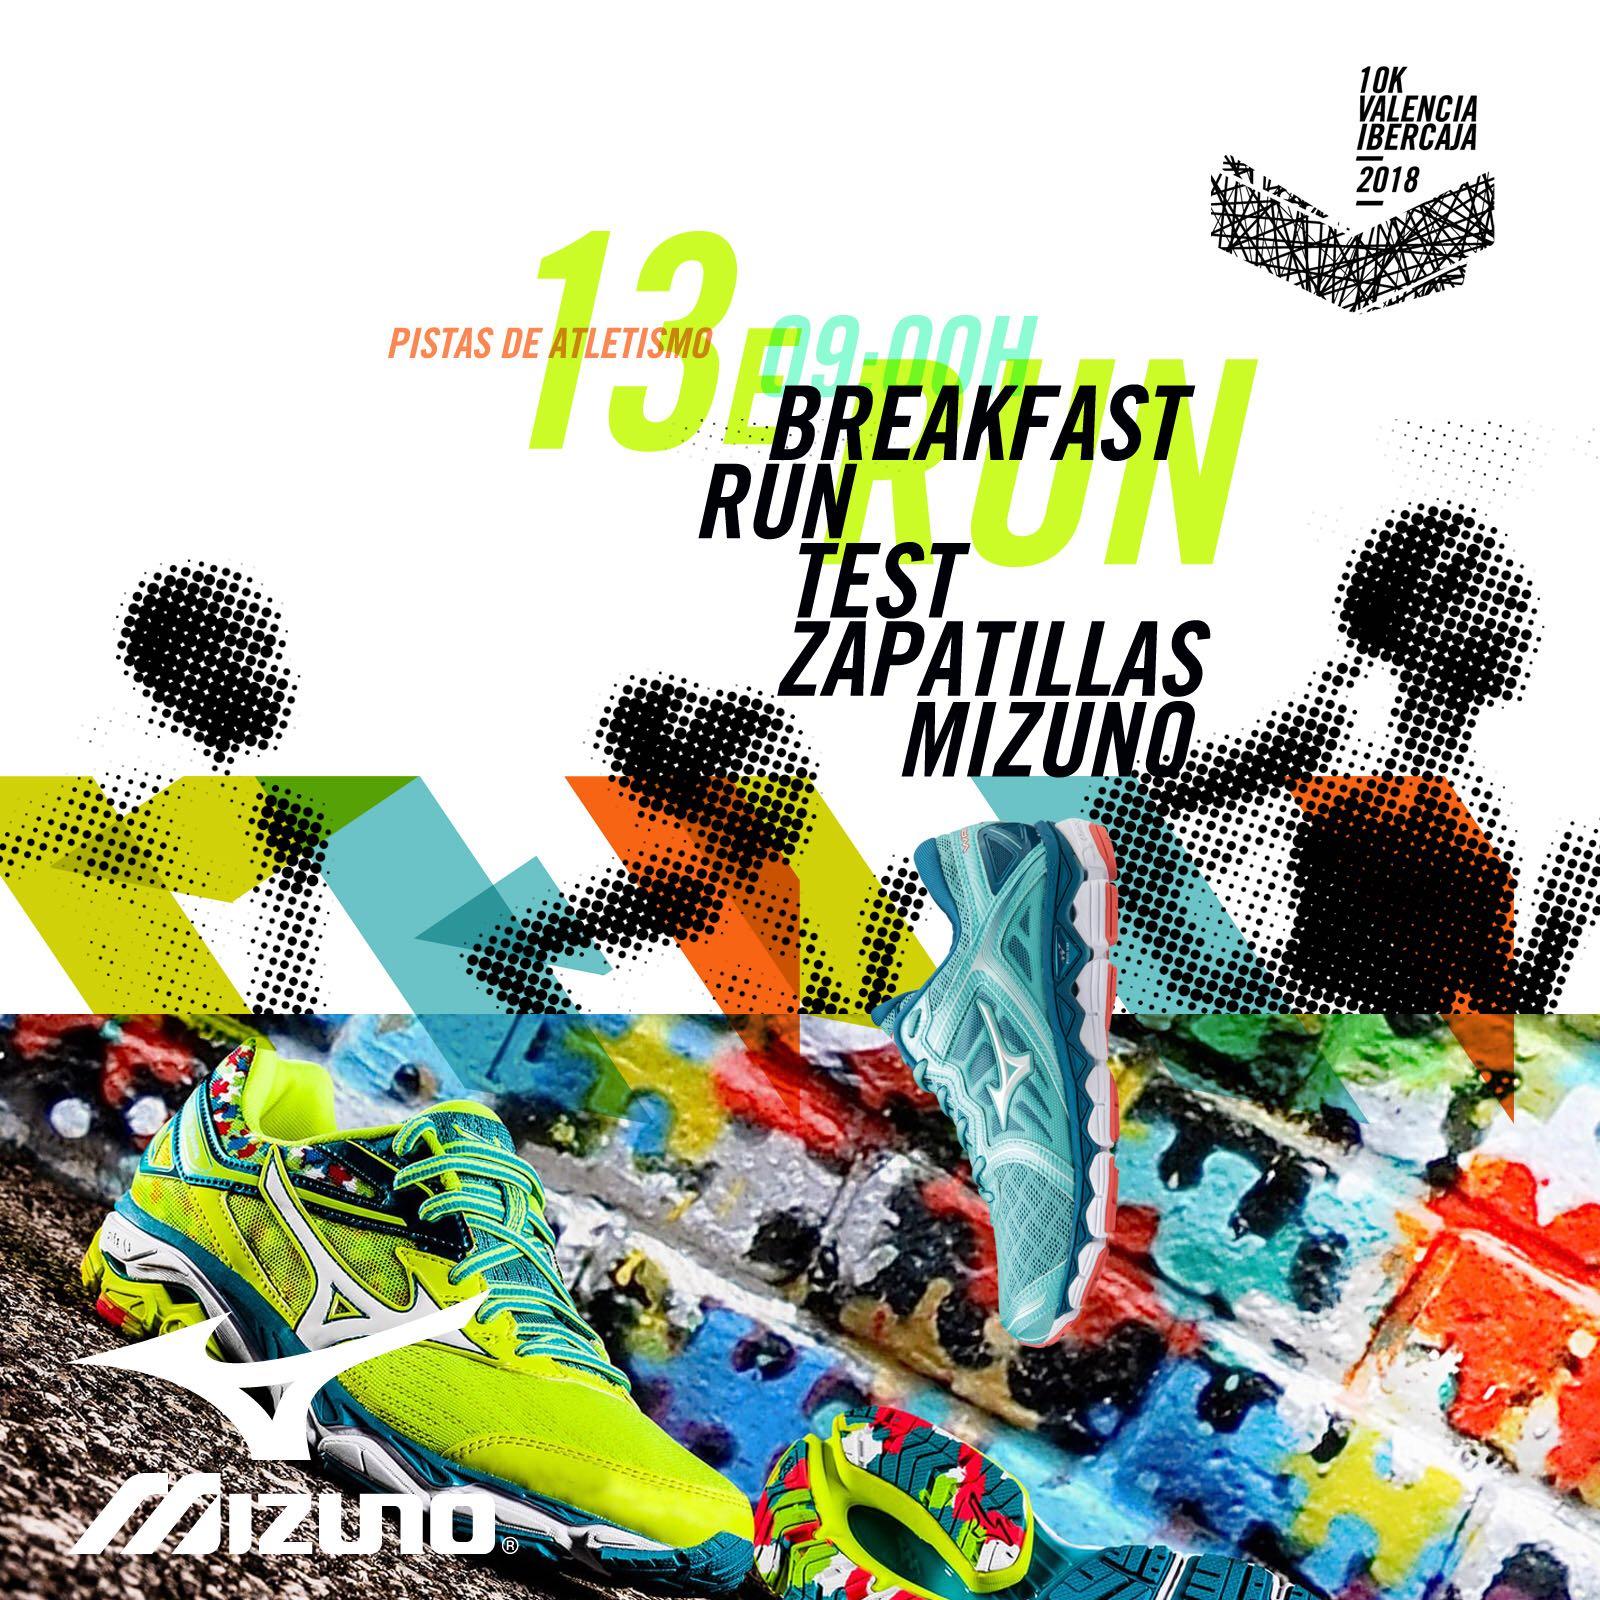 Breakfast Run 10K Valencia